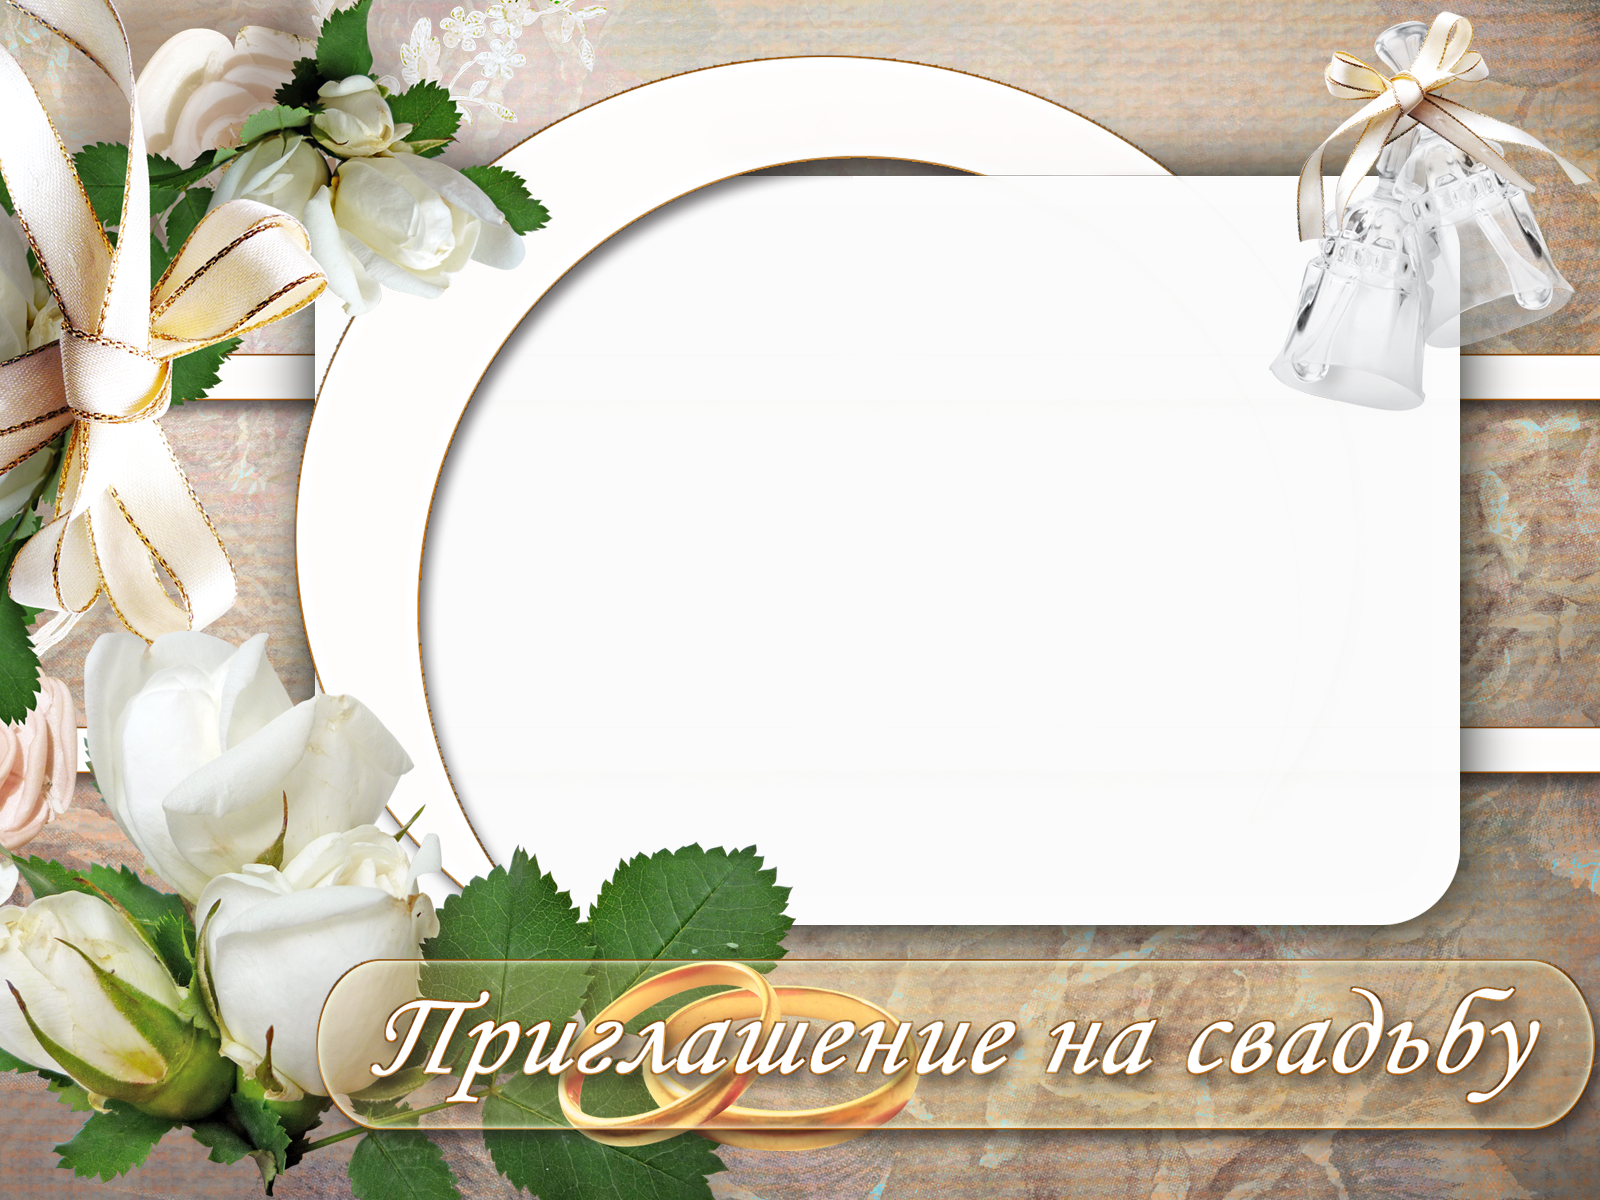 Фоторамка Приглашение на свадьбу Фоторамка для фотошопа, PNG шаблон.